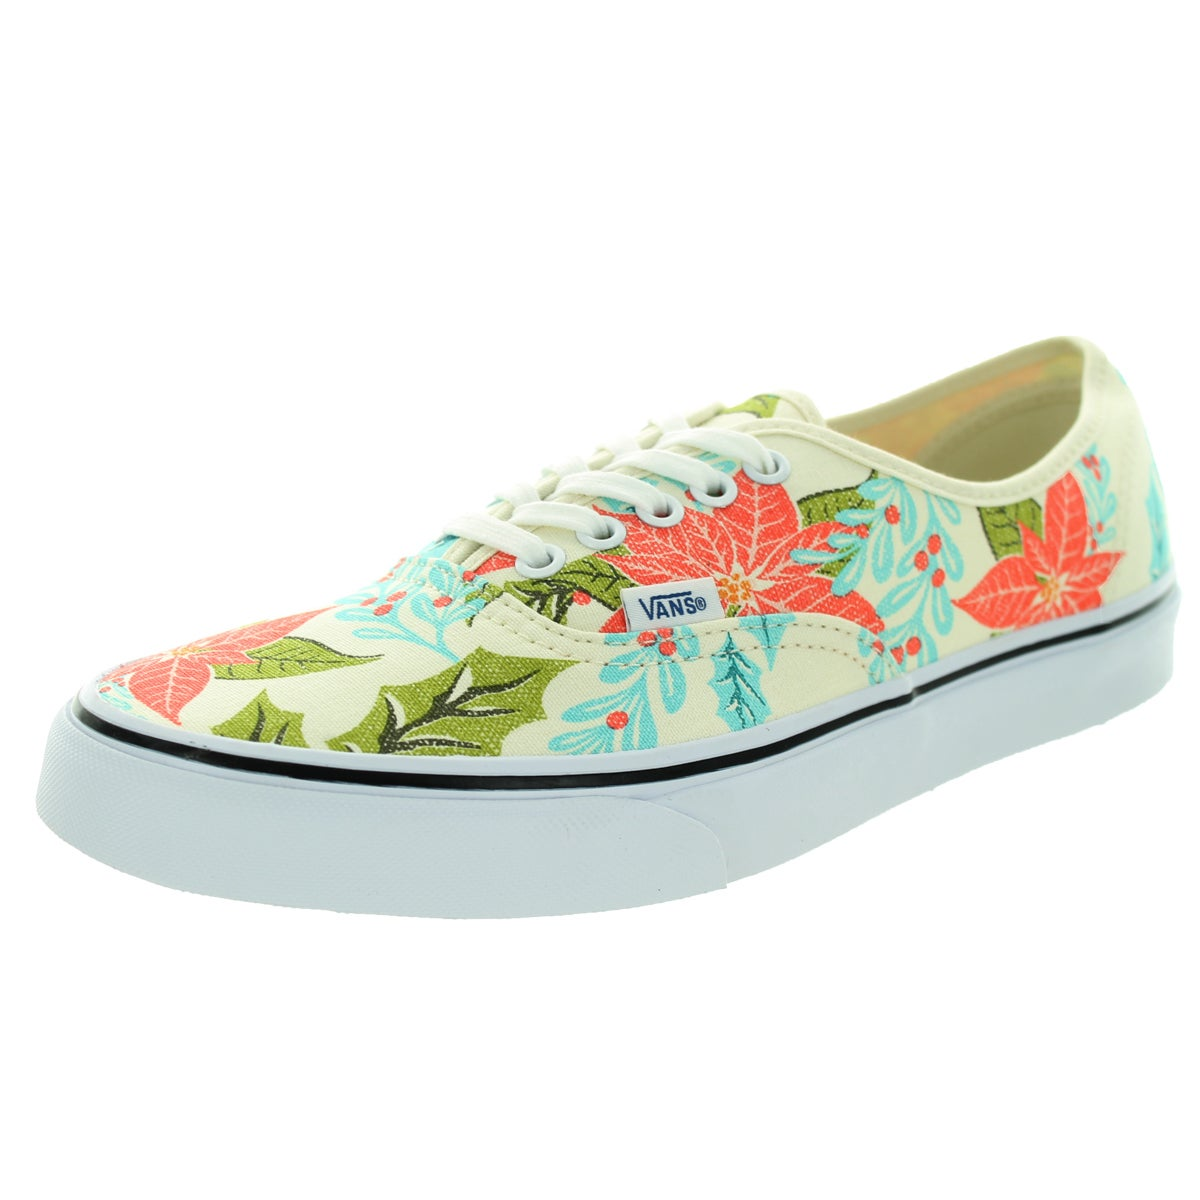 Vans Unisex Authentic Van Doren Poinsettia/Classic White Skate Shoes - Free  Shipping Today - Overstock.com - 18976406